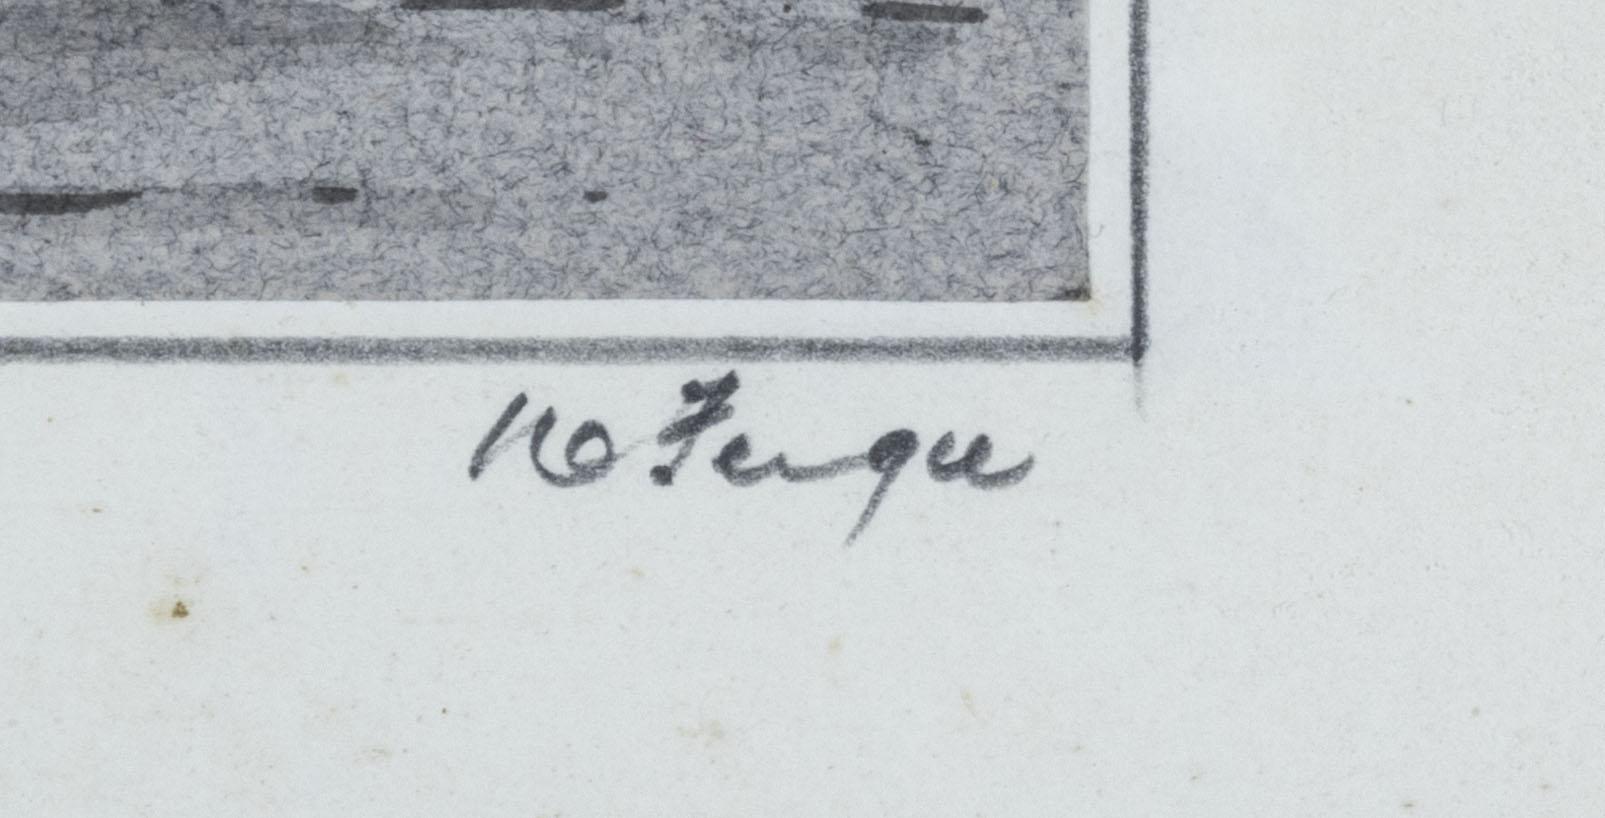 A framed print 'Berwick on Tweed' signed W Fergie, 13cm x 18cm - Image 4 of 6